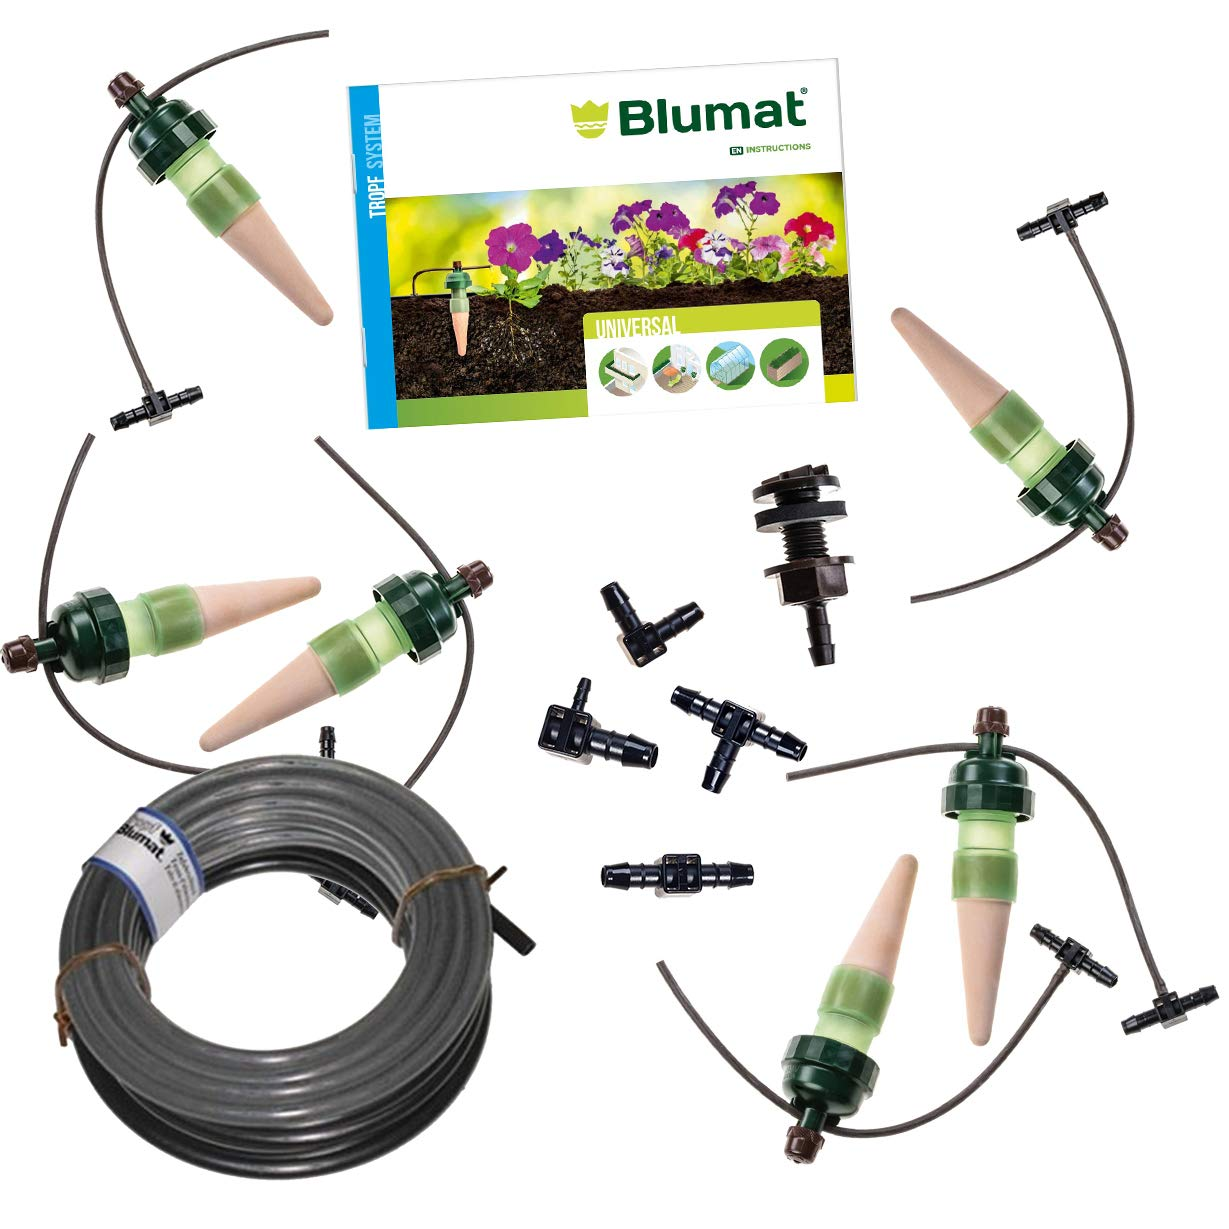 Tropf-Blumat IG15654 Deck and Planter Box Kit, Small by Tropf-Blumat